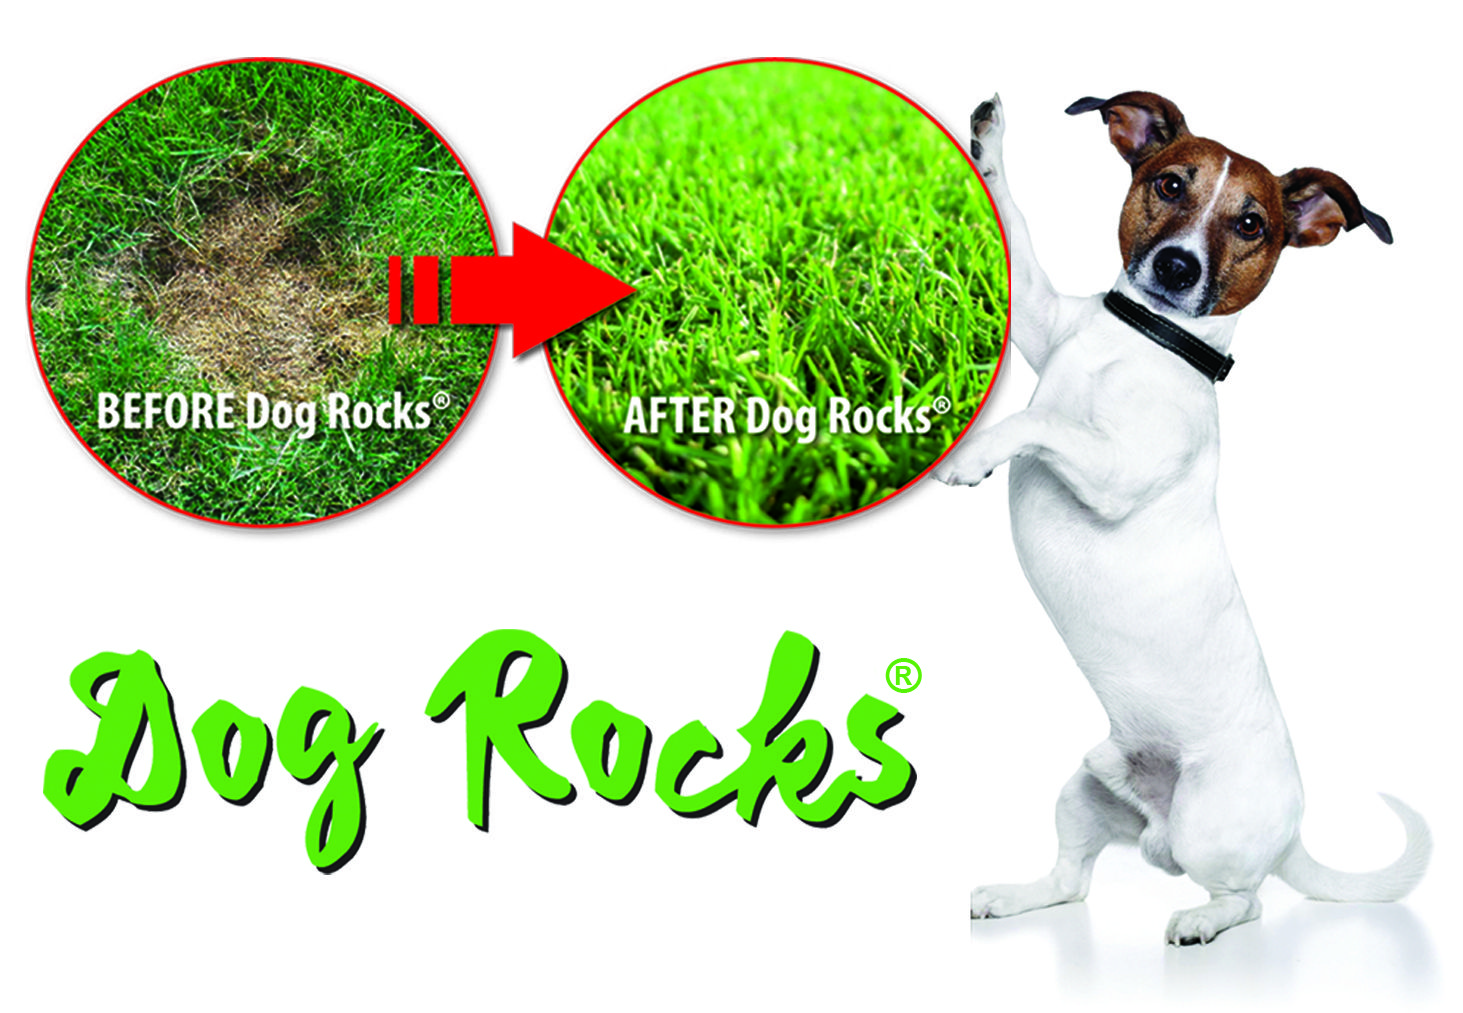 Dog Rocks Are The Natural Solution To Dog Urine Burns Marks Dog Rocks Dog Urine Dogs